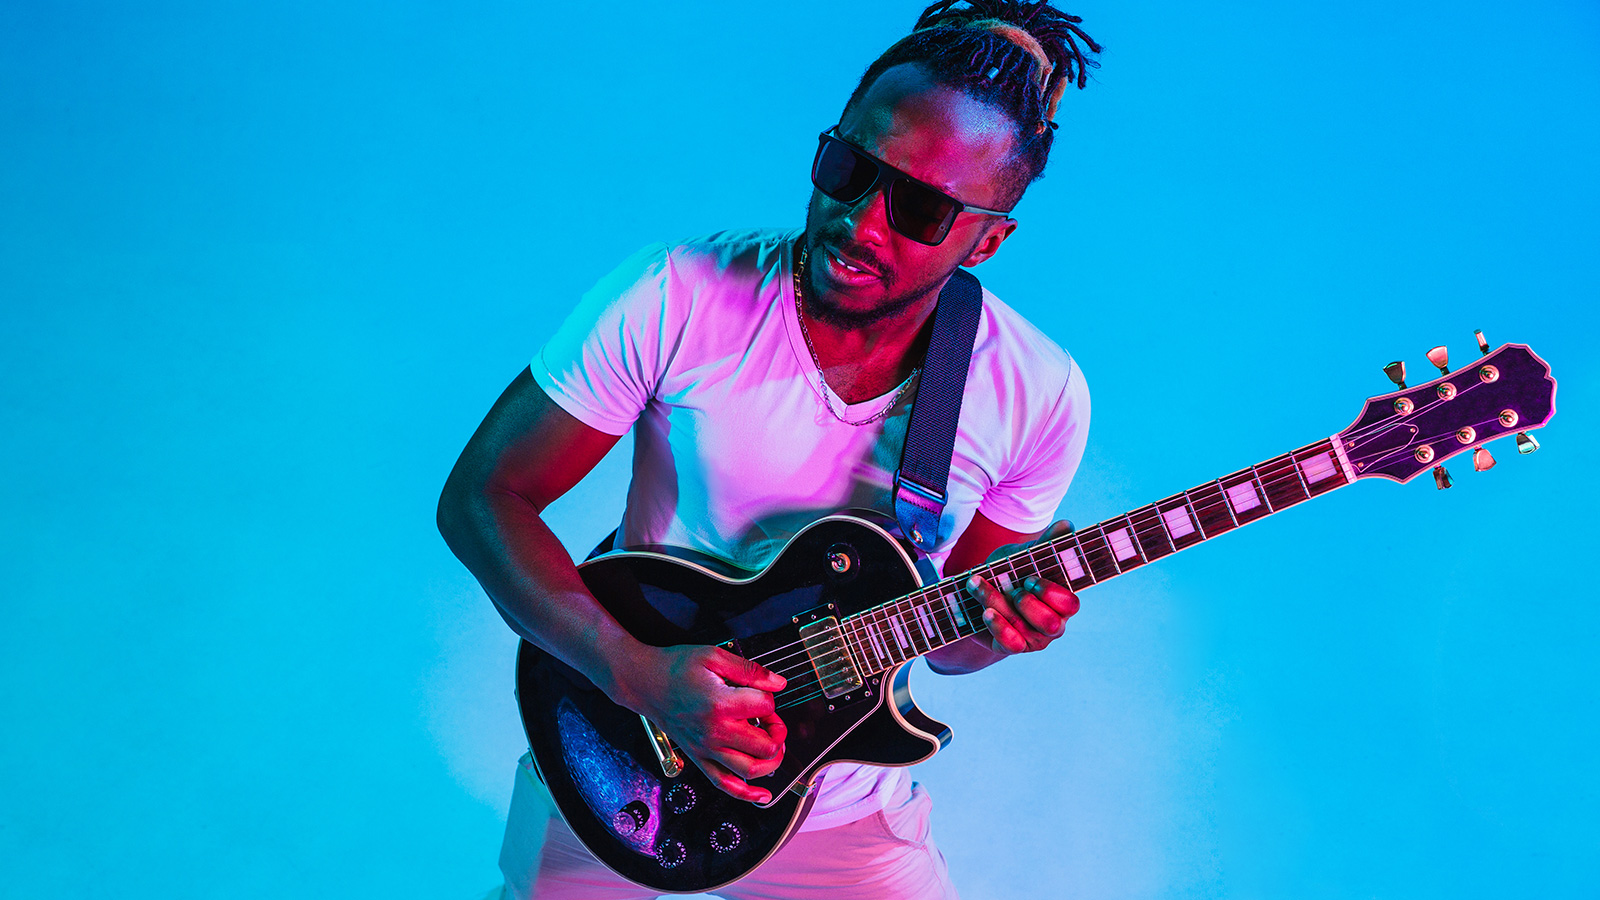 man-guitar